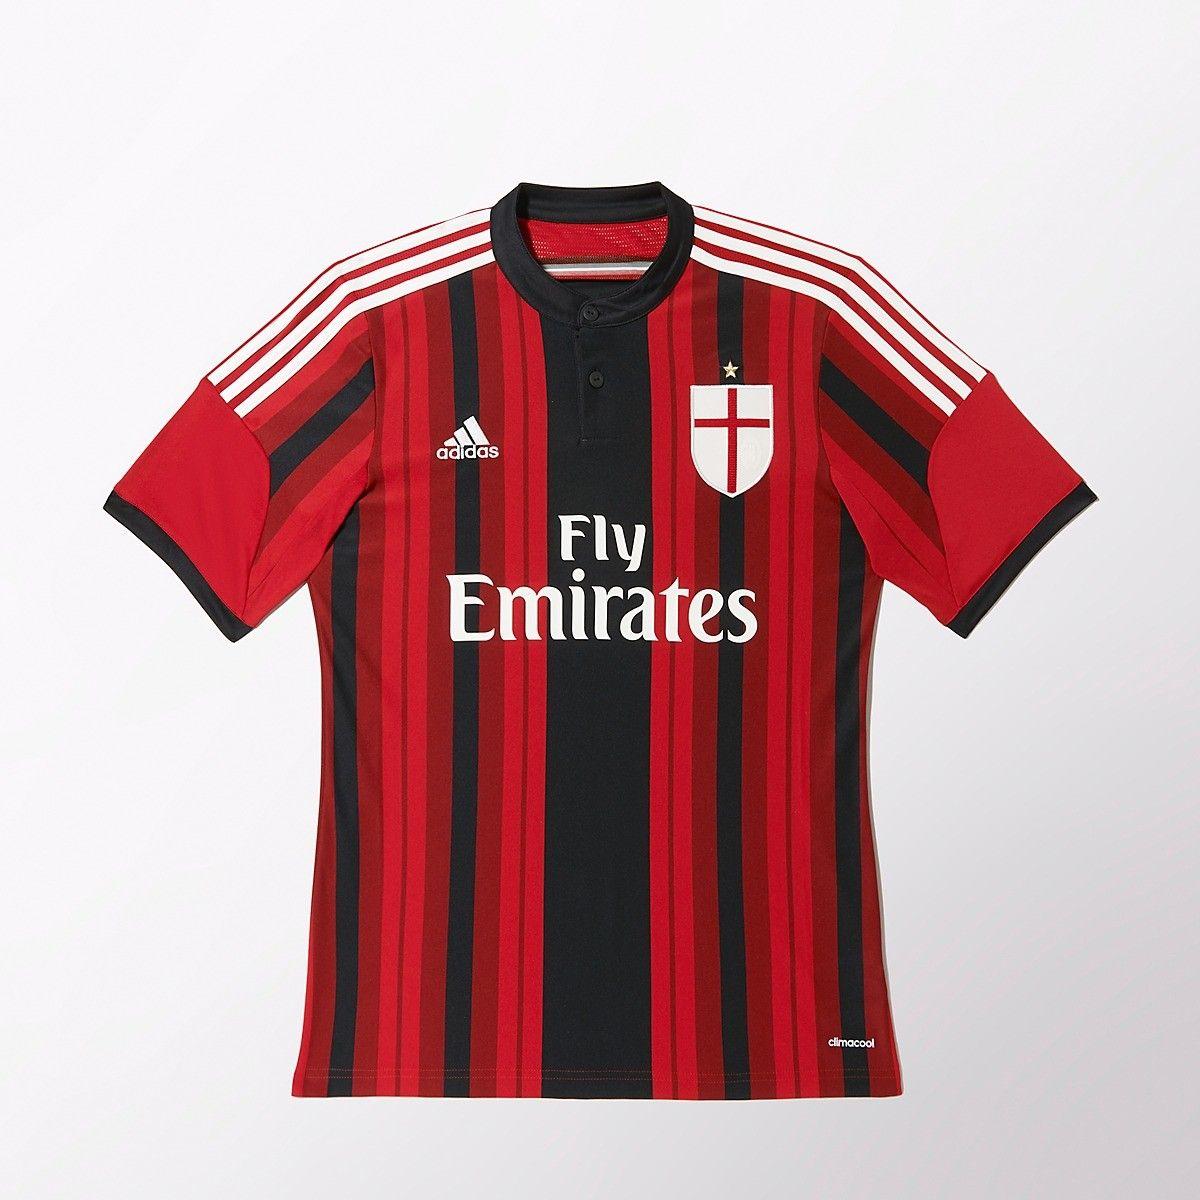 Sentimental Convertir Eléctrico  Adidas AC Milan Home Jersey 14/15 | Retro football shirts, Ac milan, Shirts